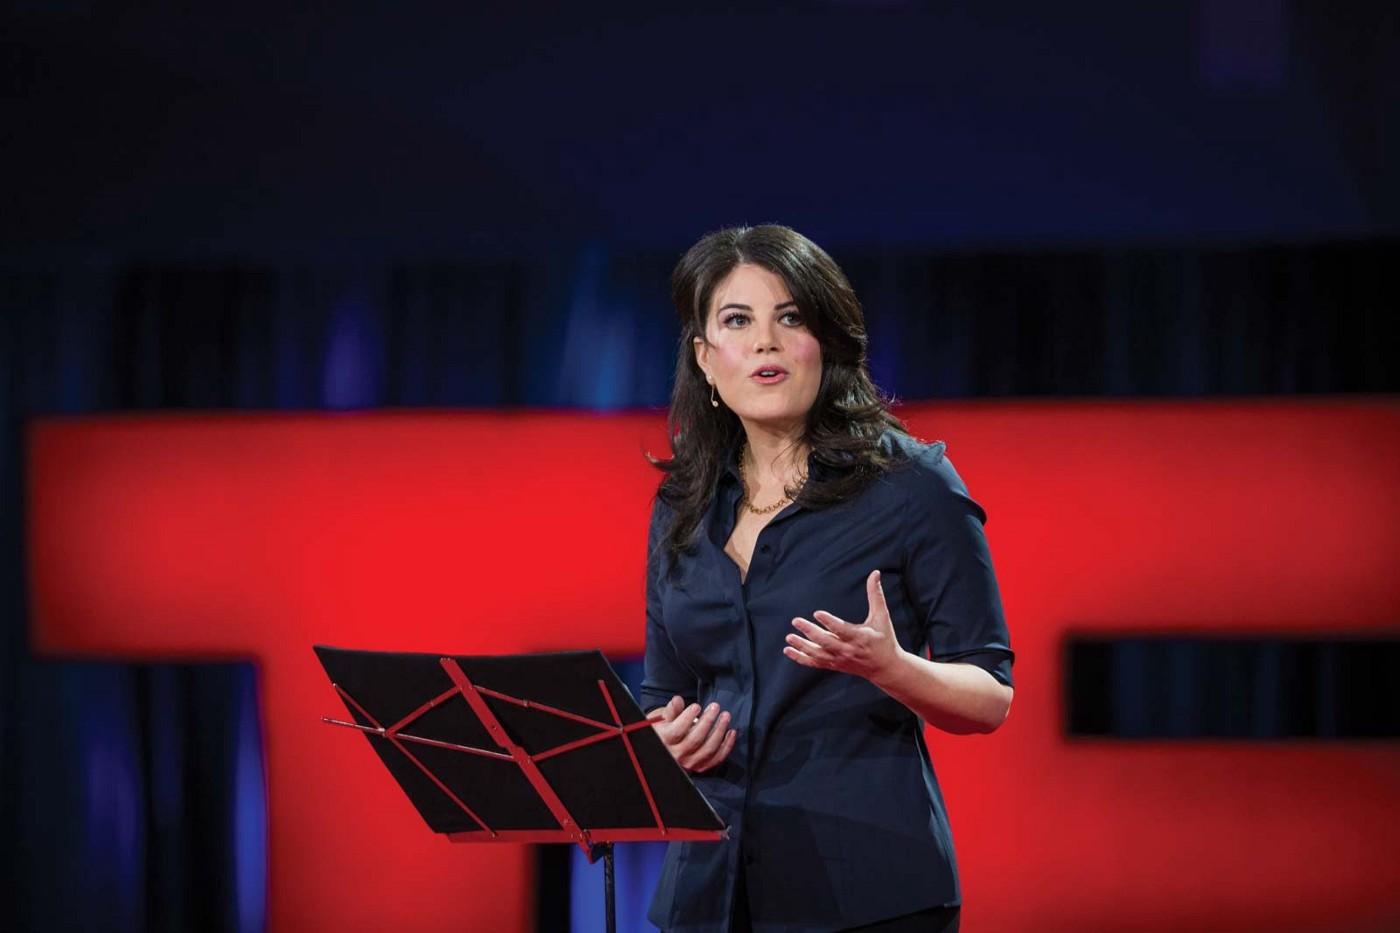 Monica Lewinsky: The Political Scapegoat